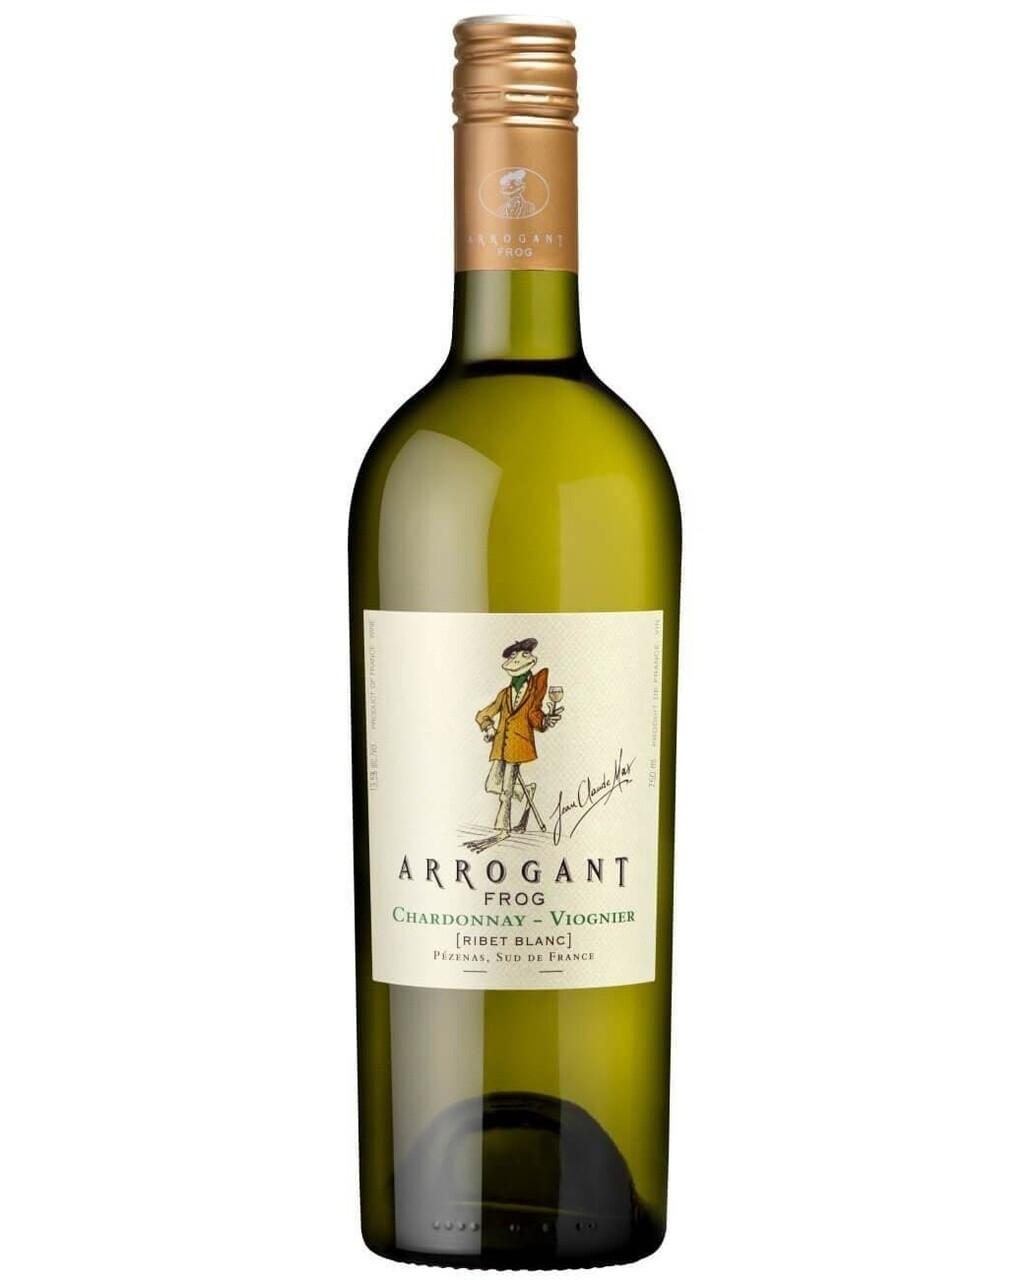 Paul Mas Arrogant Frog Ribet Blanc Chardonnay Viognier